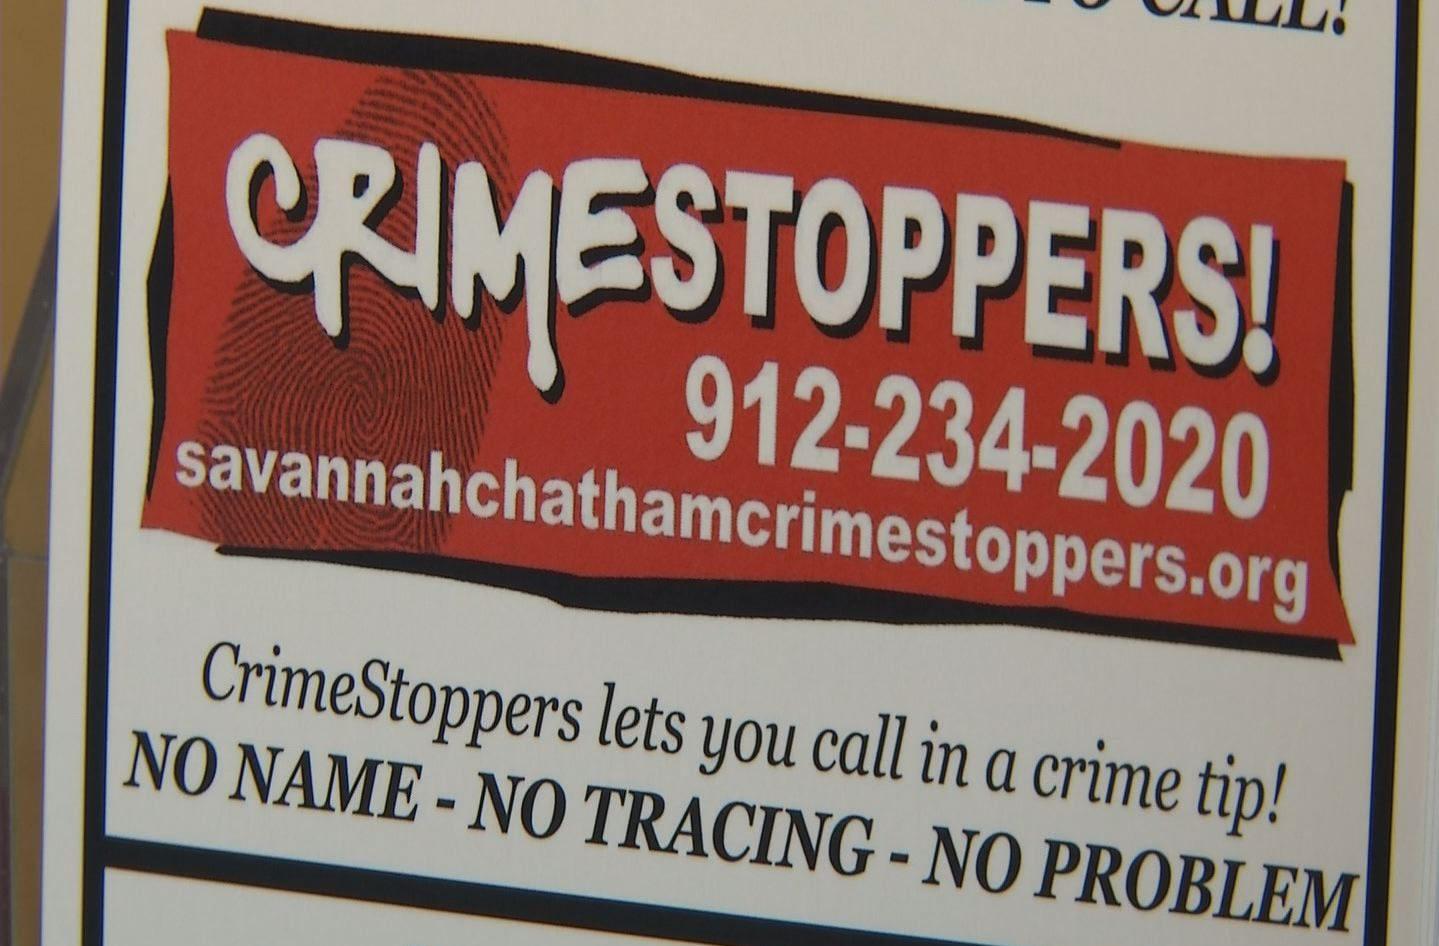 crimestoppers_47686